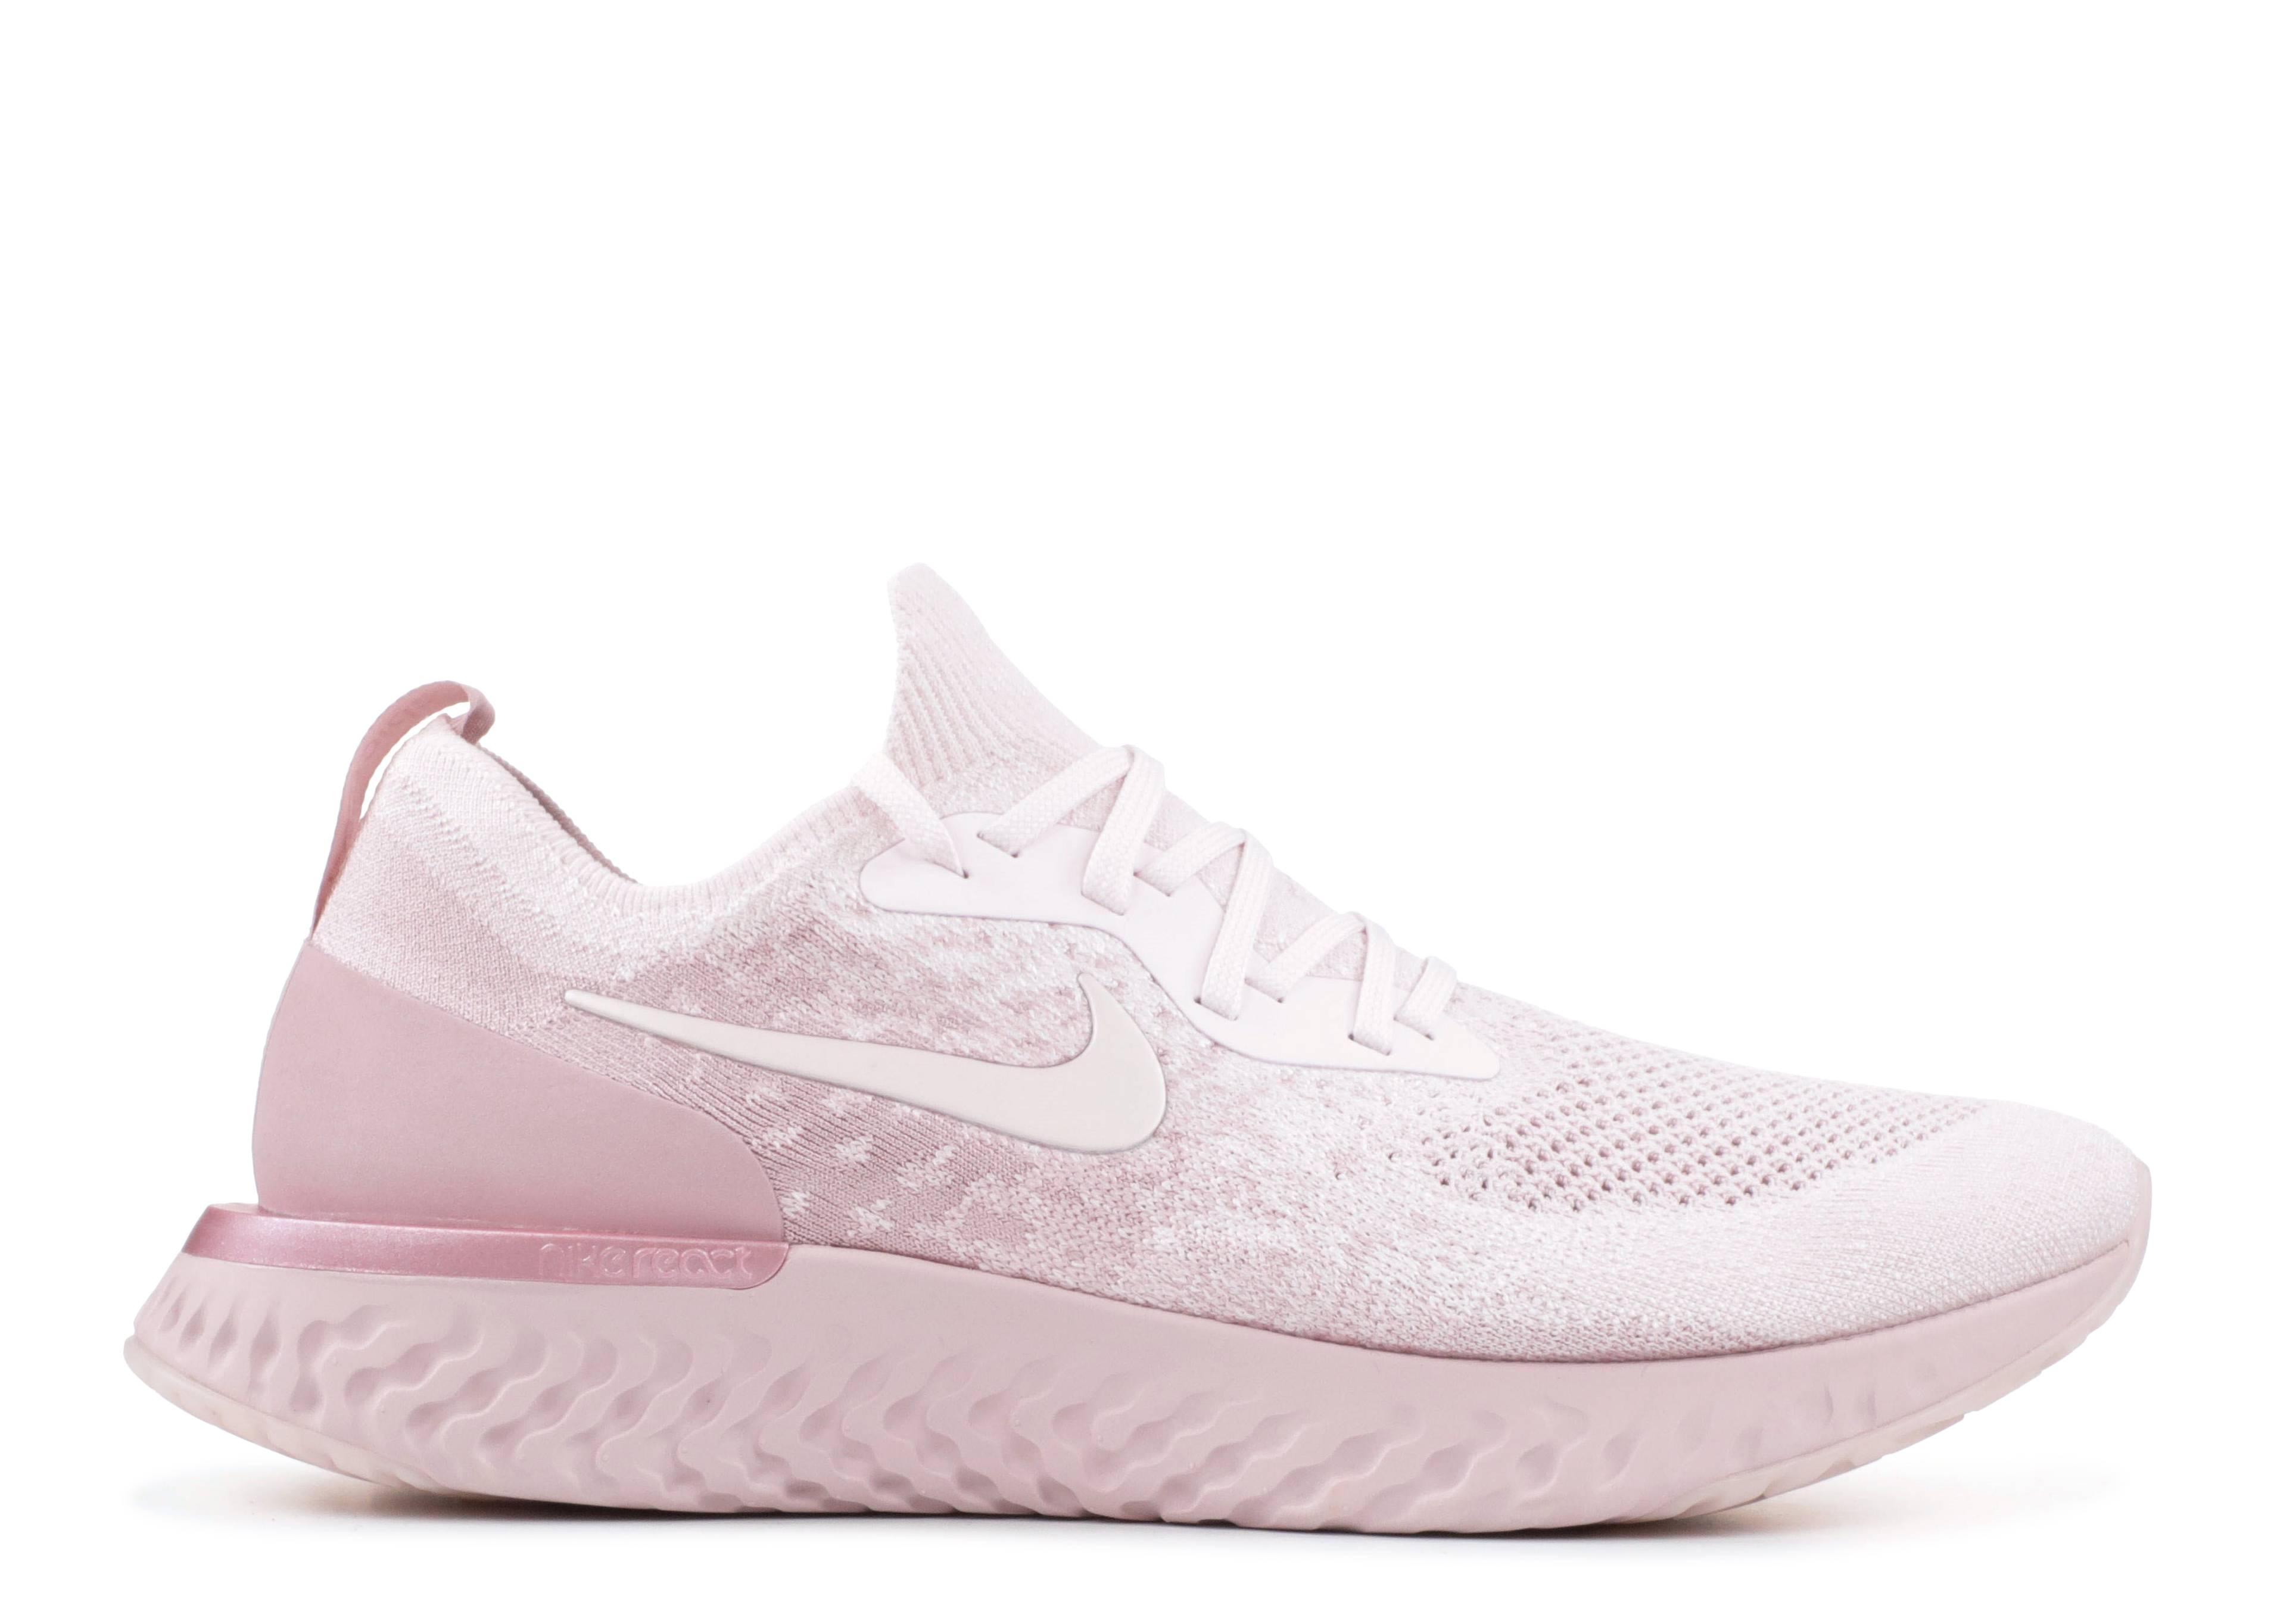 518670e8d481 Nike Epic React Flyknit - Nike - aq0067 600 - pearl pink